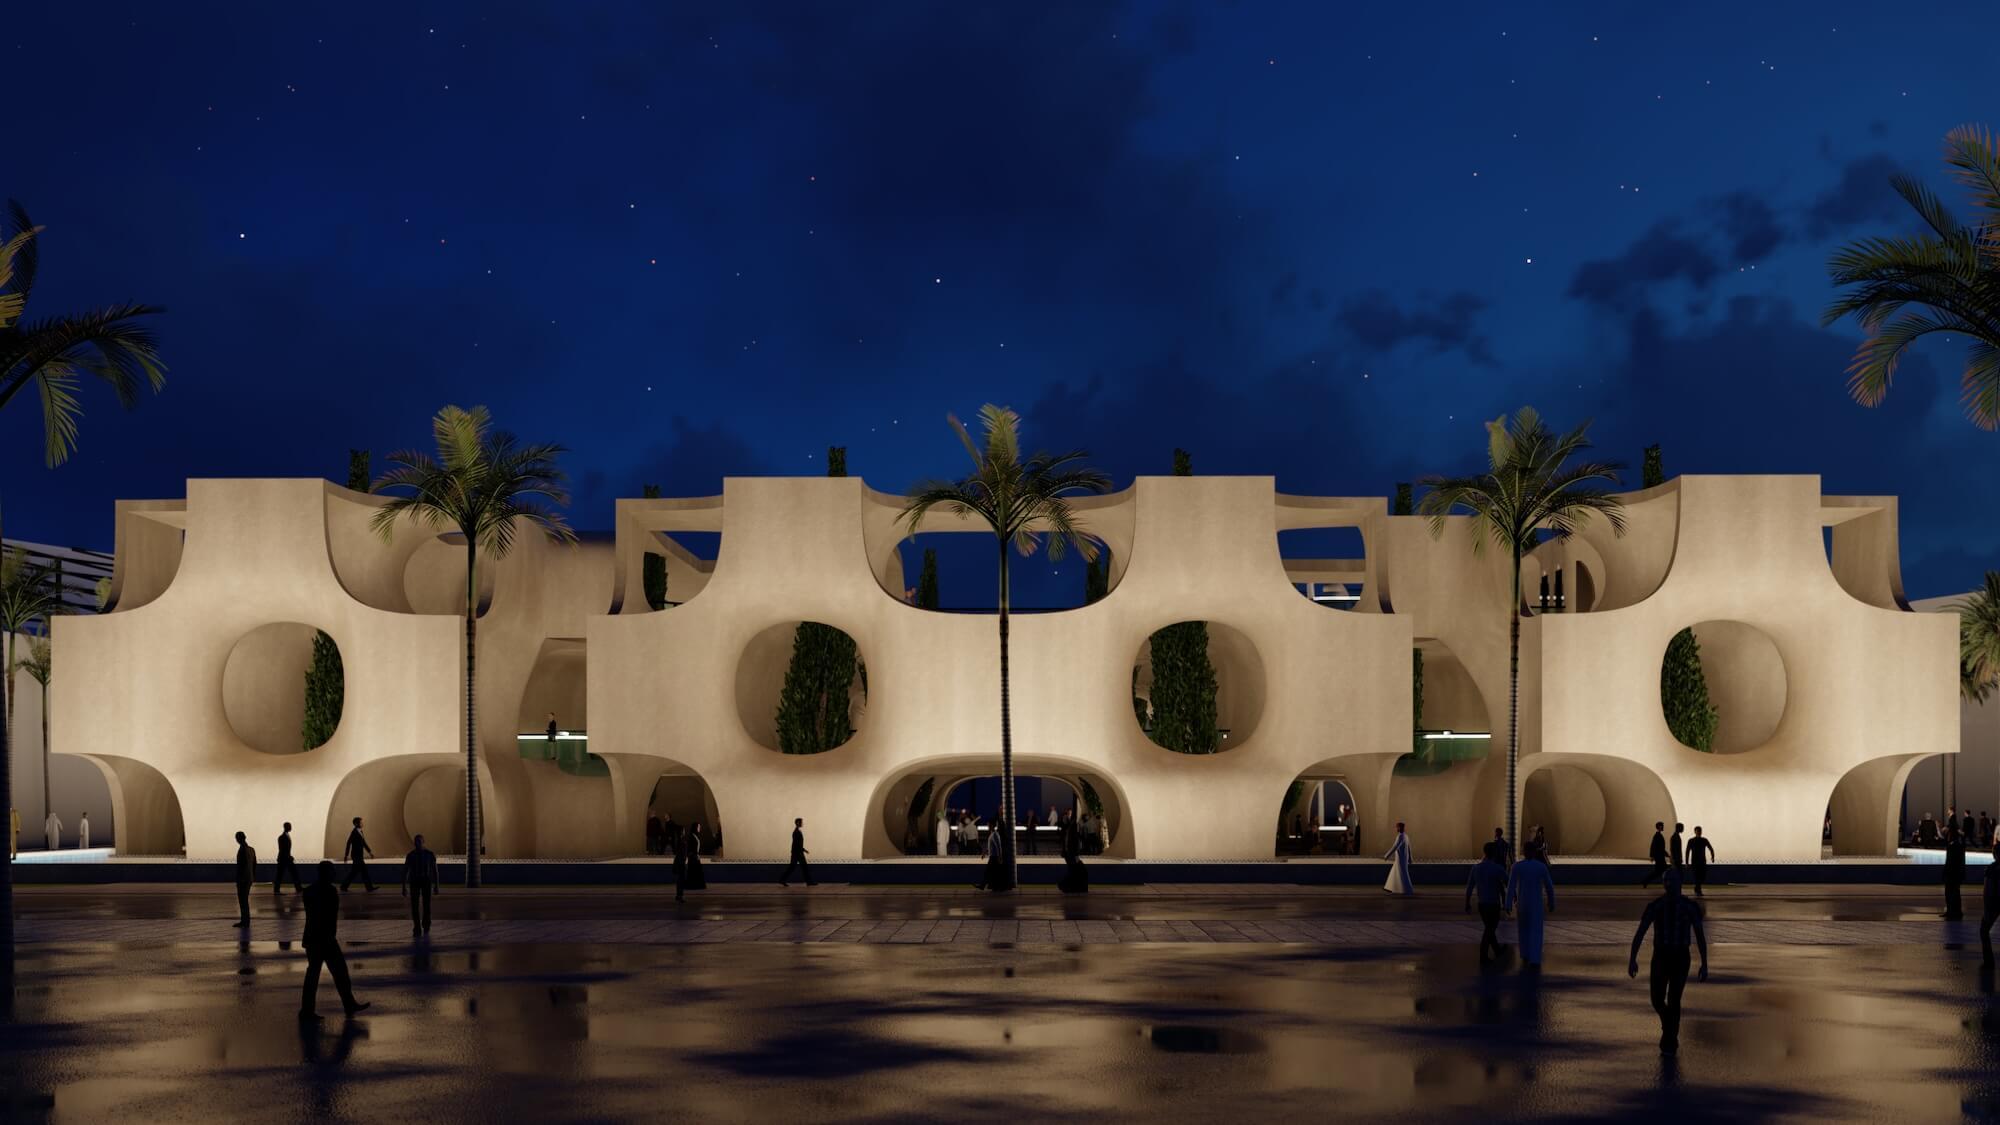 IranPavilion/Foto: Ali-Ahmadi